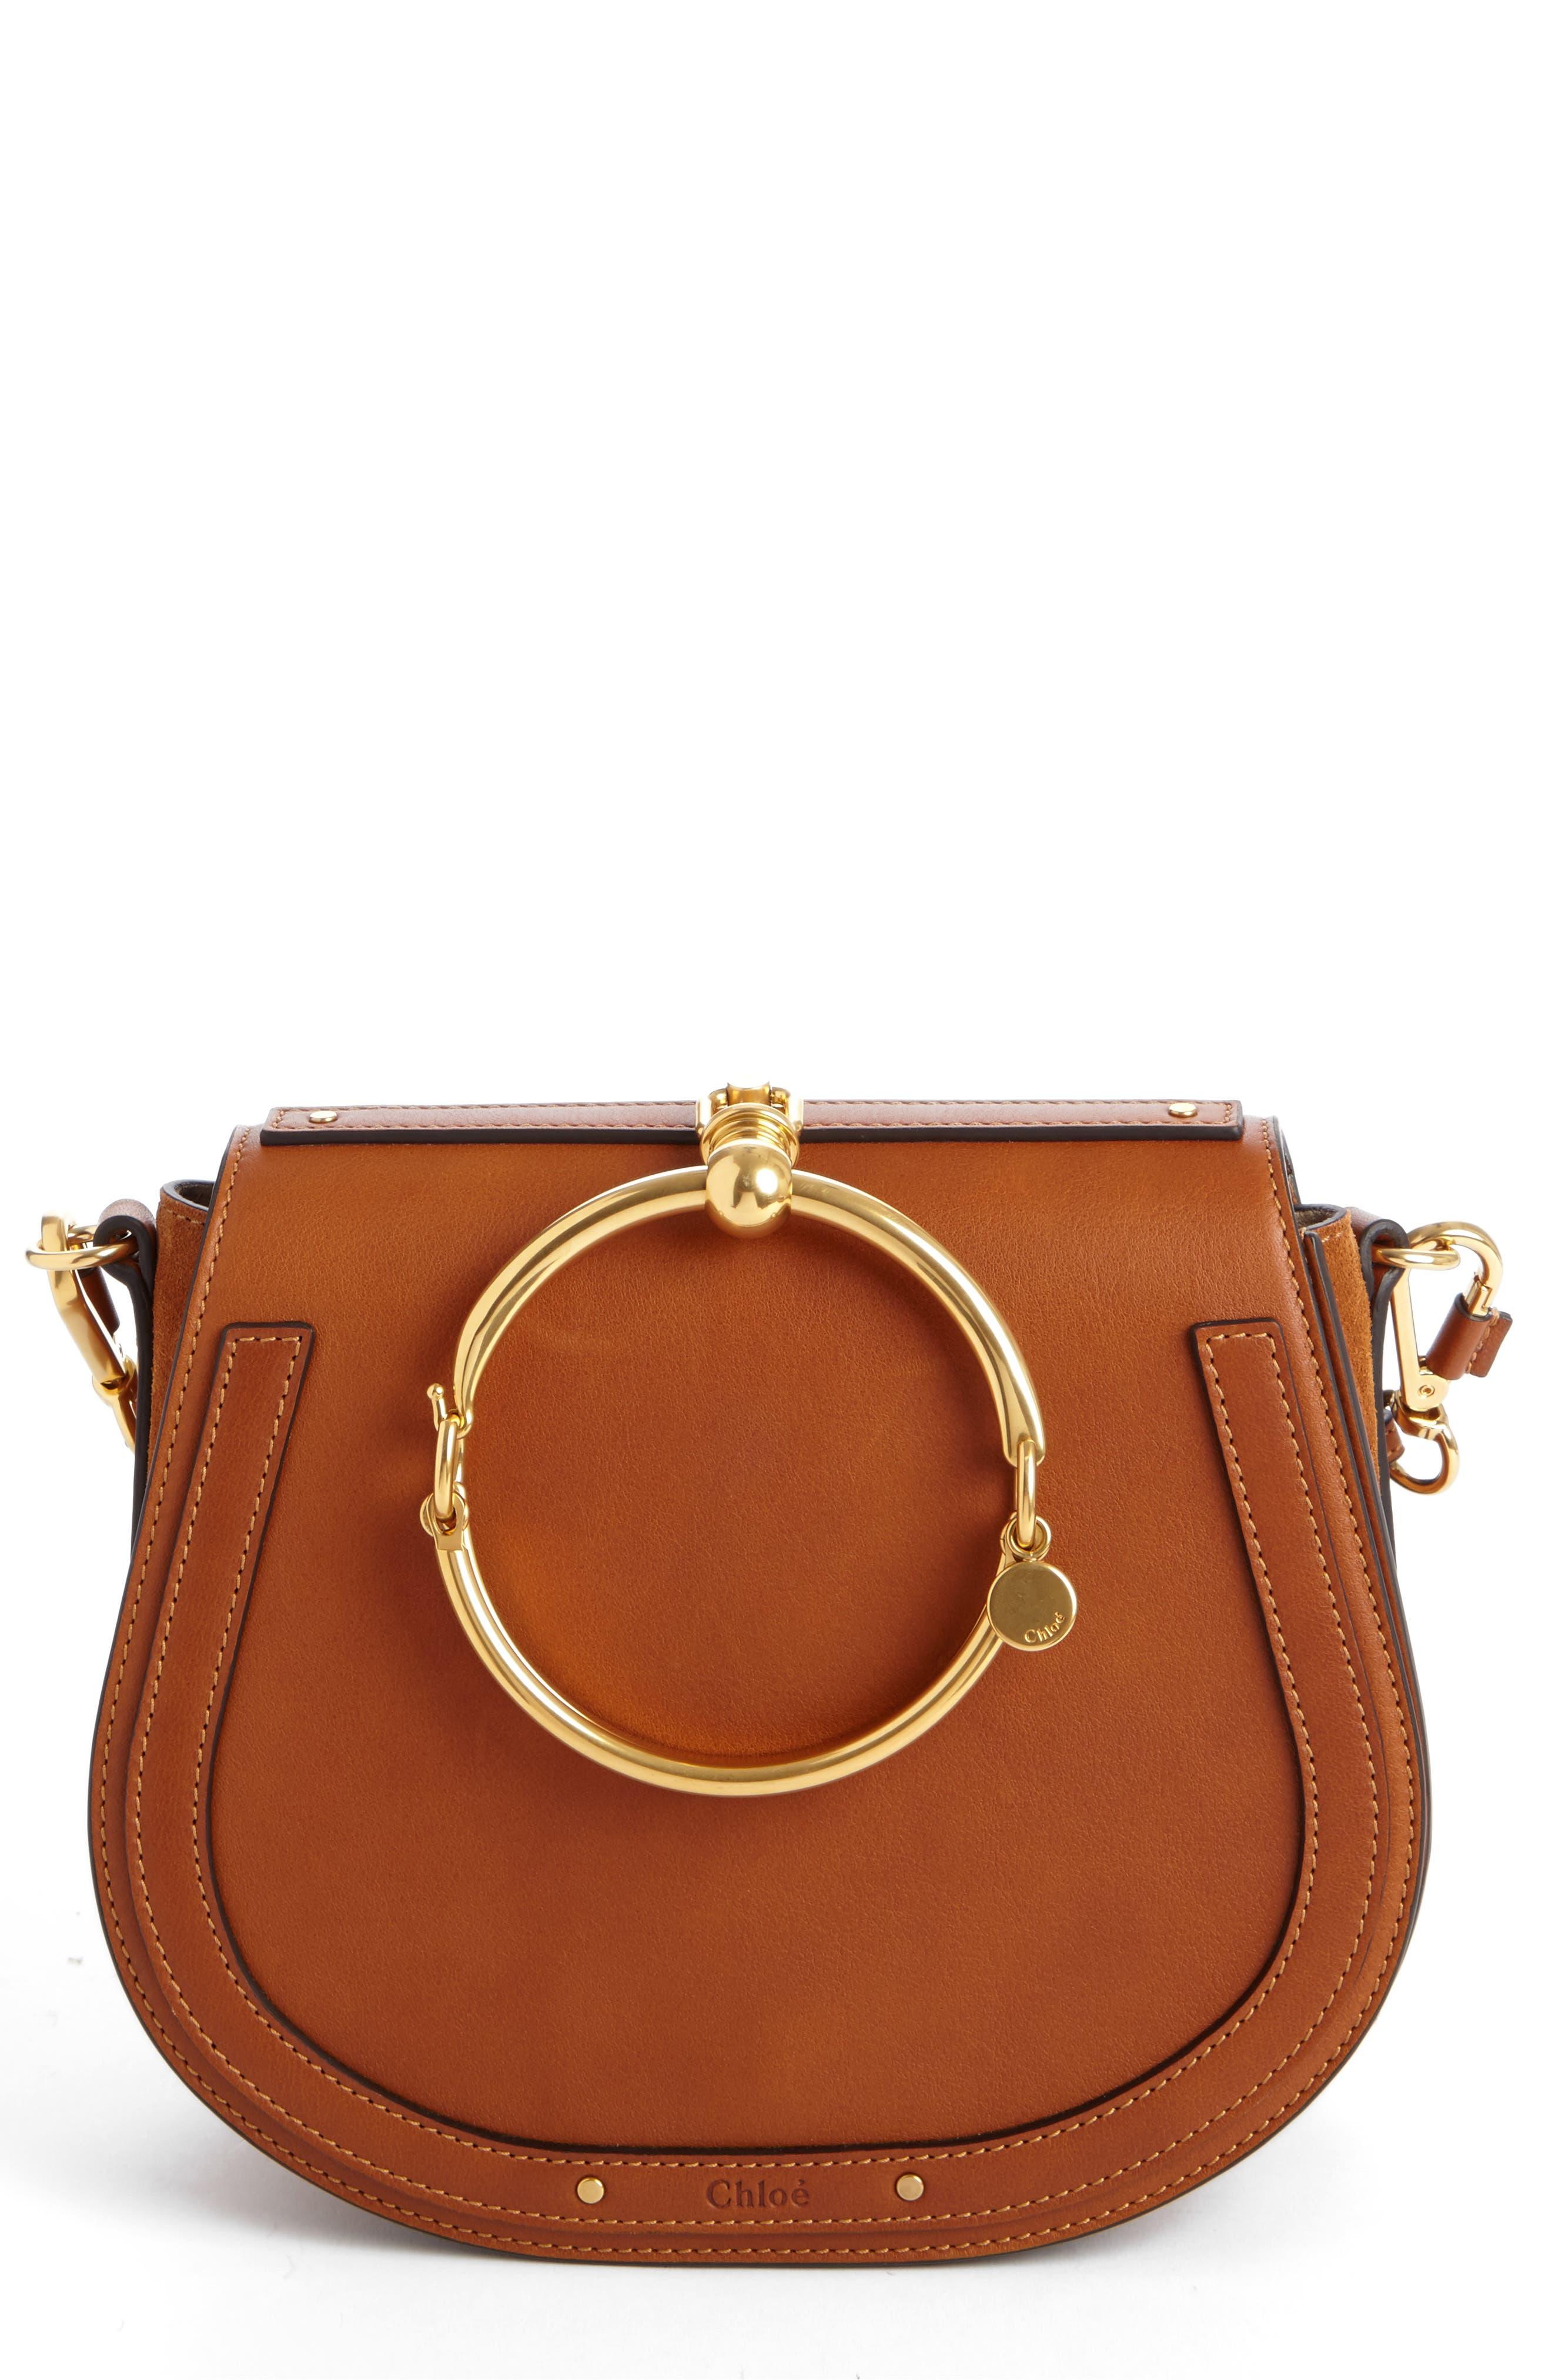 Medium Nile Leather Bracelet Saddle Bag,                         Main,                         color, Bdu Caramel